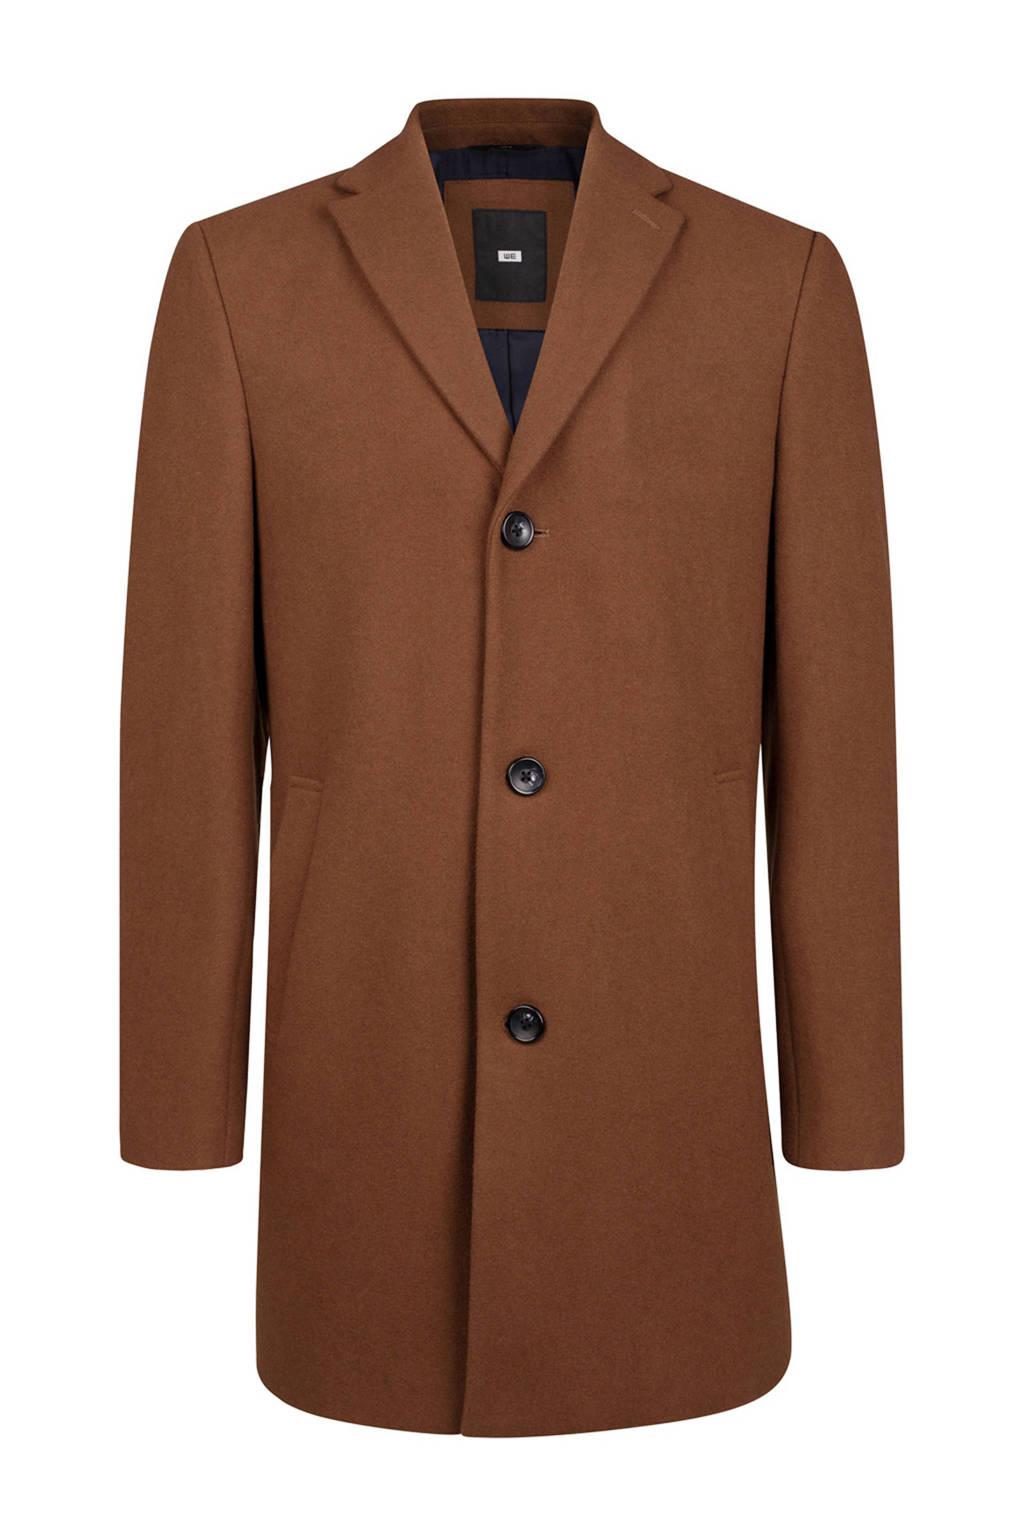 WE Fashion wollen coat bruin, Gingerbread